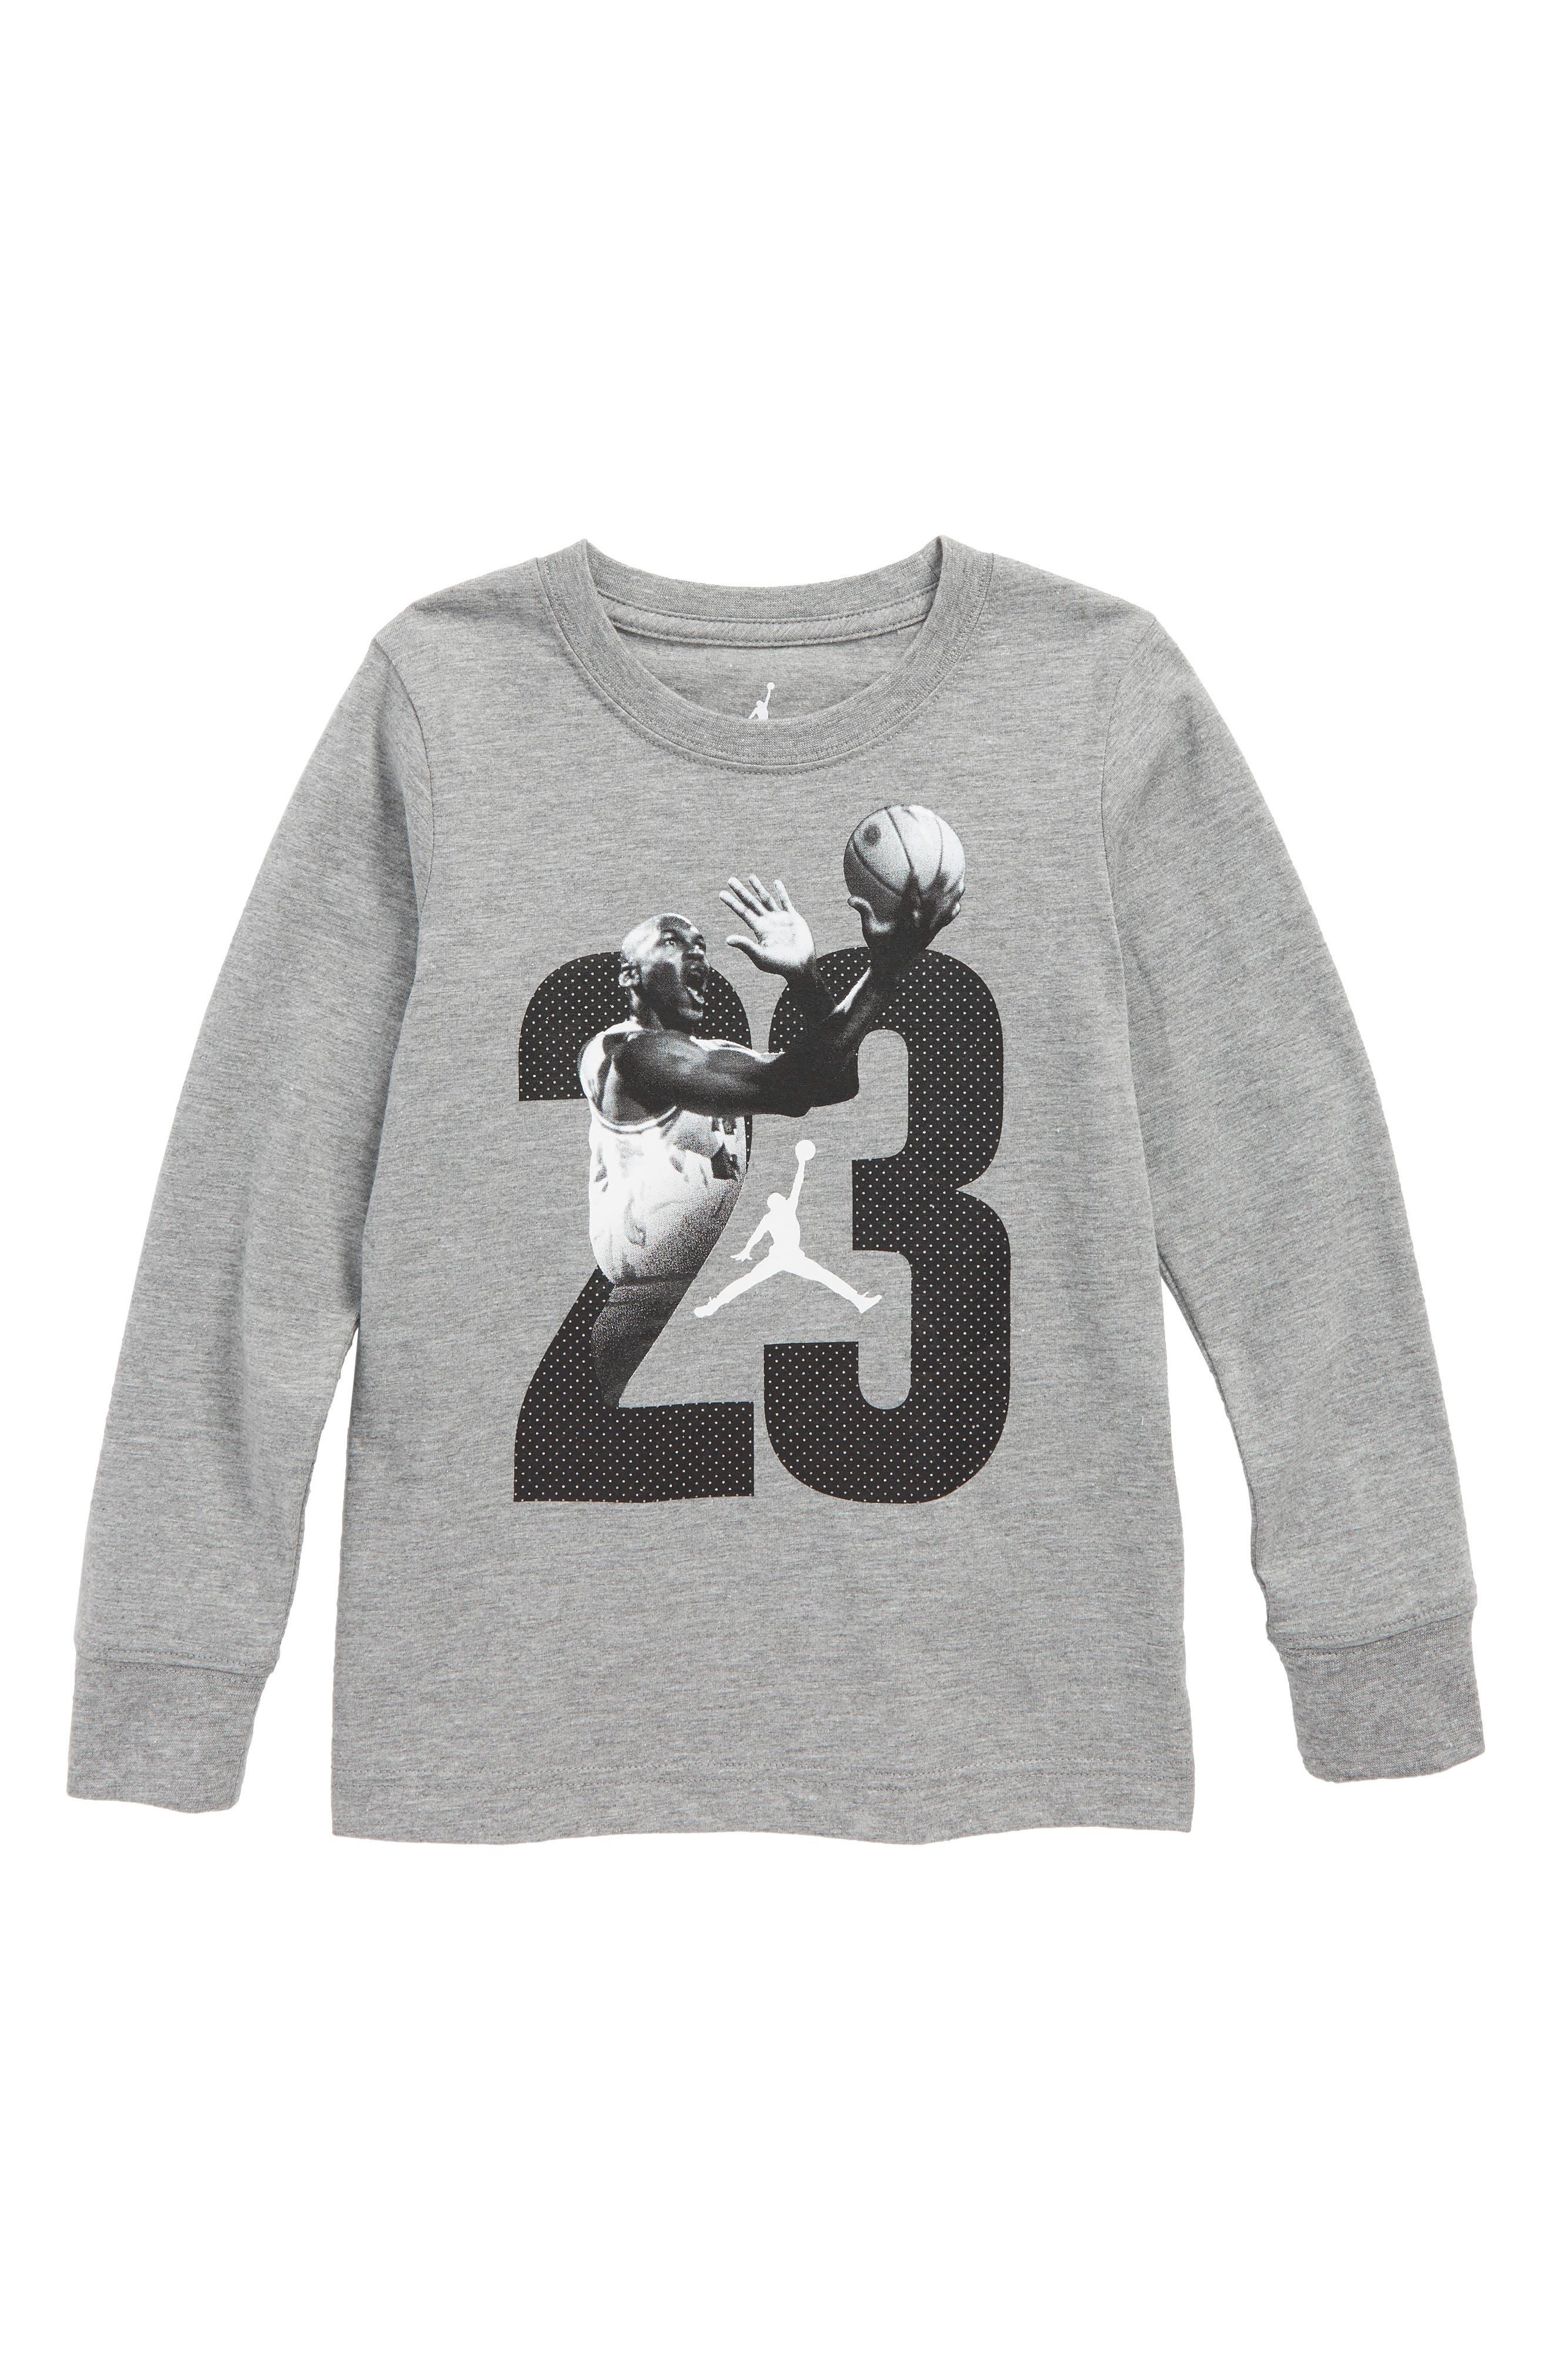 Jordan 23 Graphic Long Sleeve T-Shirt,                         Main,                         color,